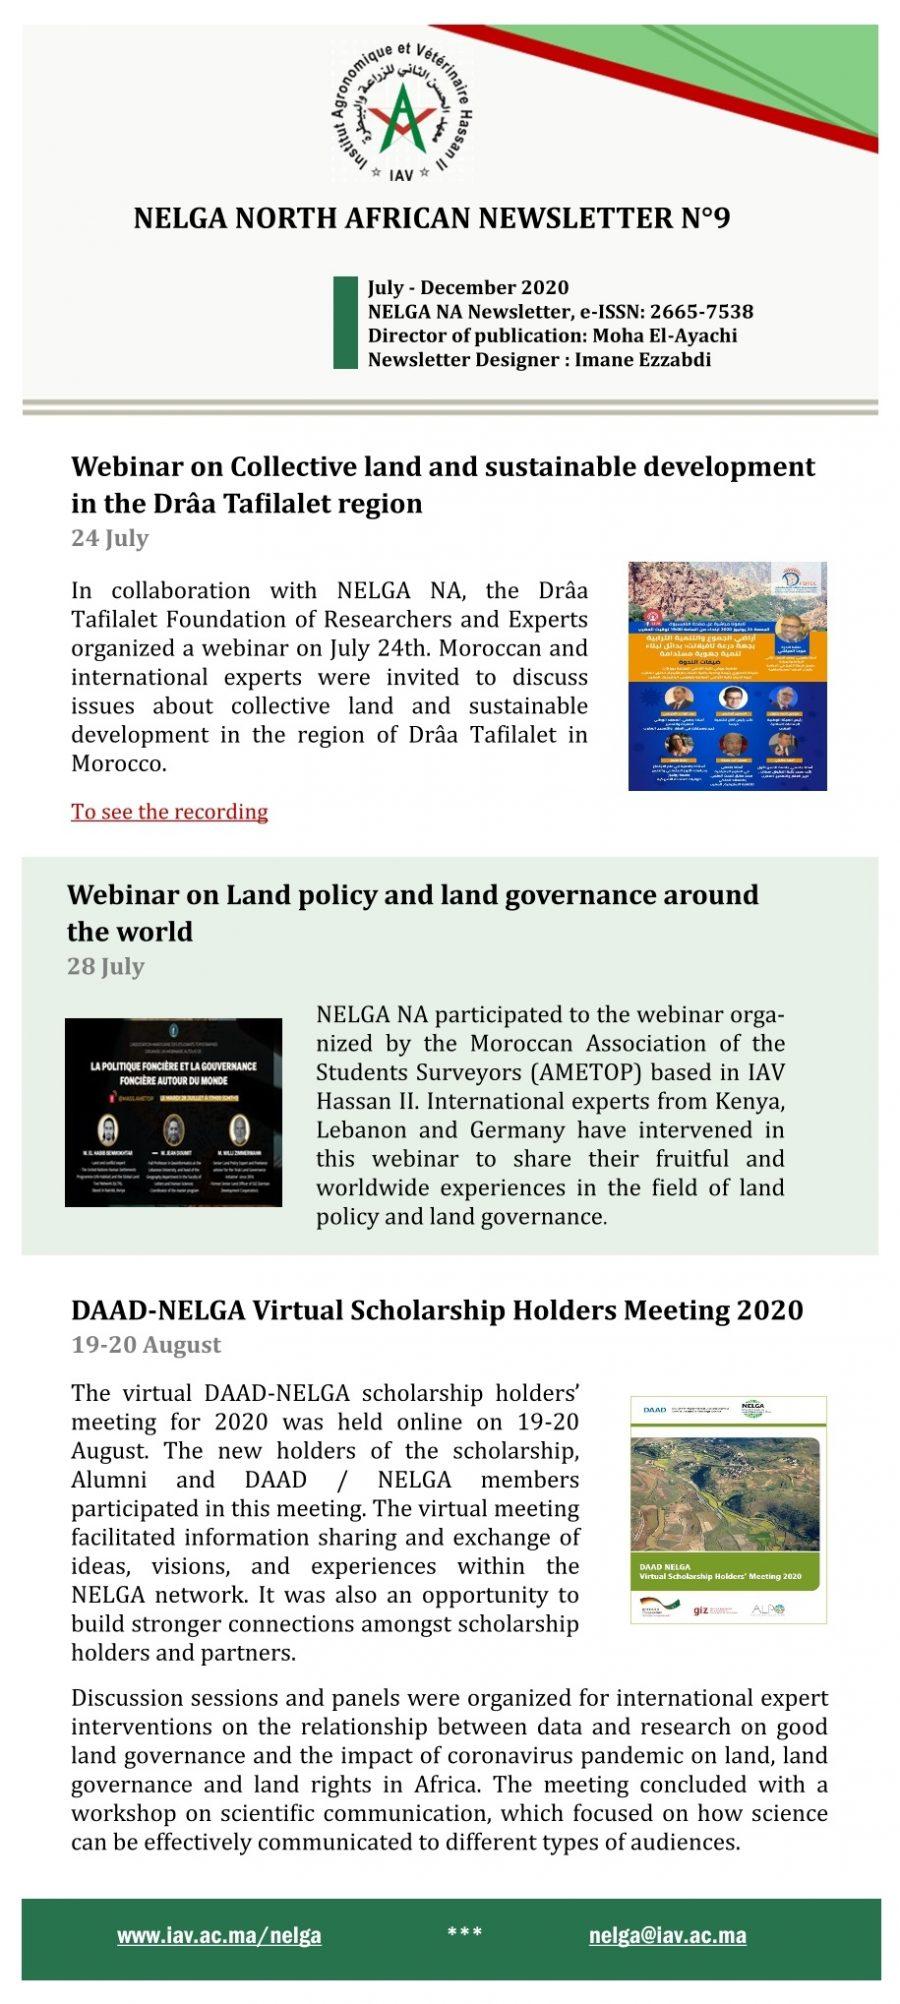 NELGA North African Newsletter N°9